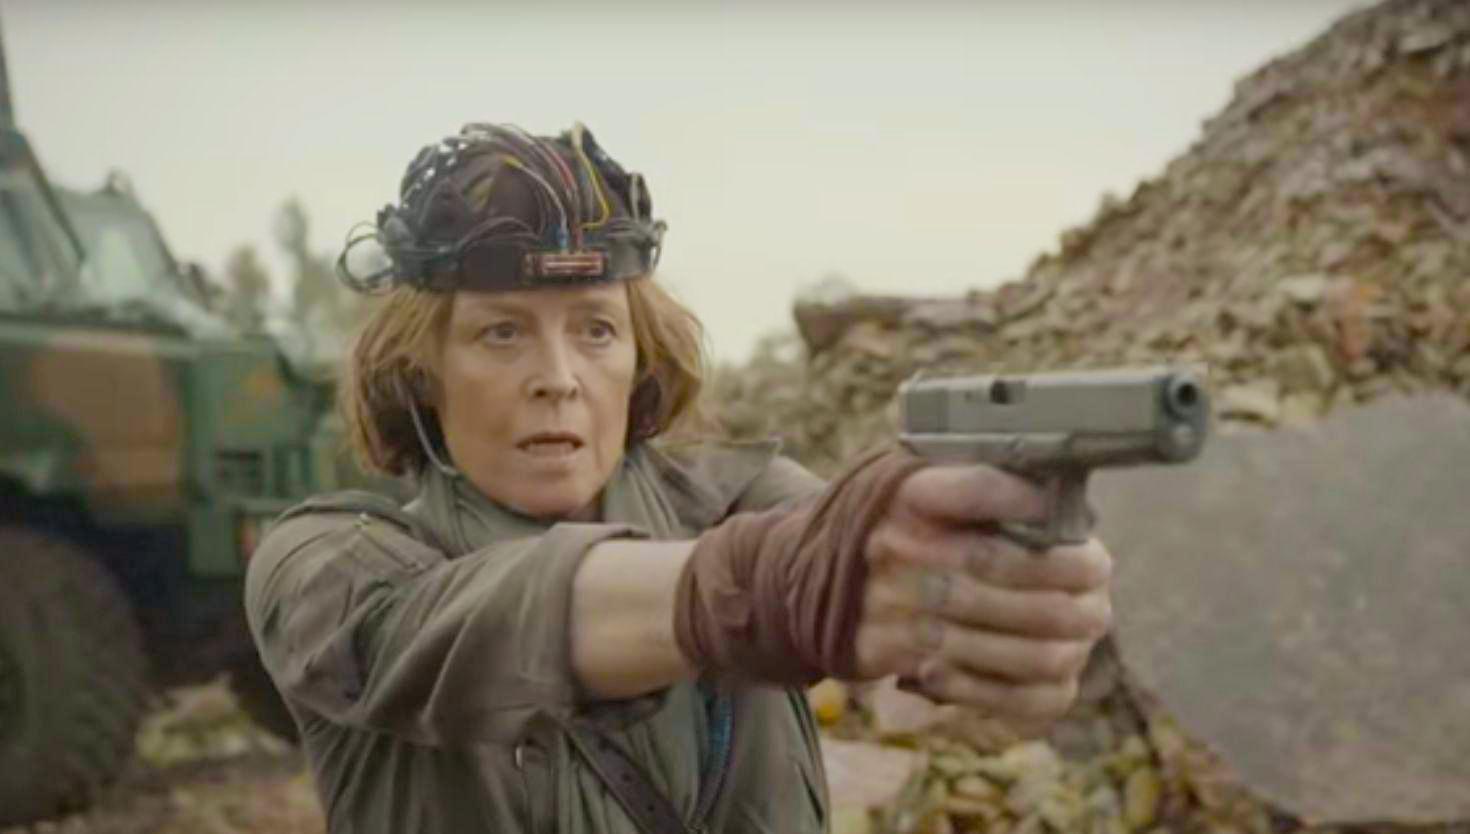 Watch The New Neill Blomkamp Directed Sci-Fi movie Rakka For Free Here!